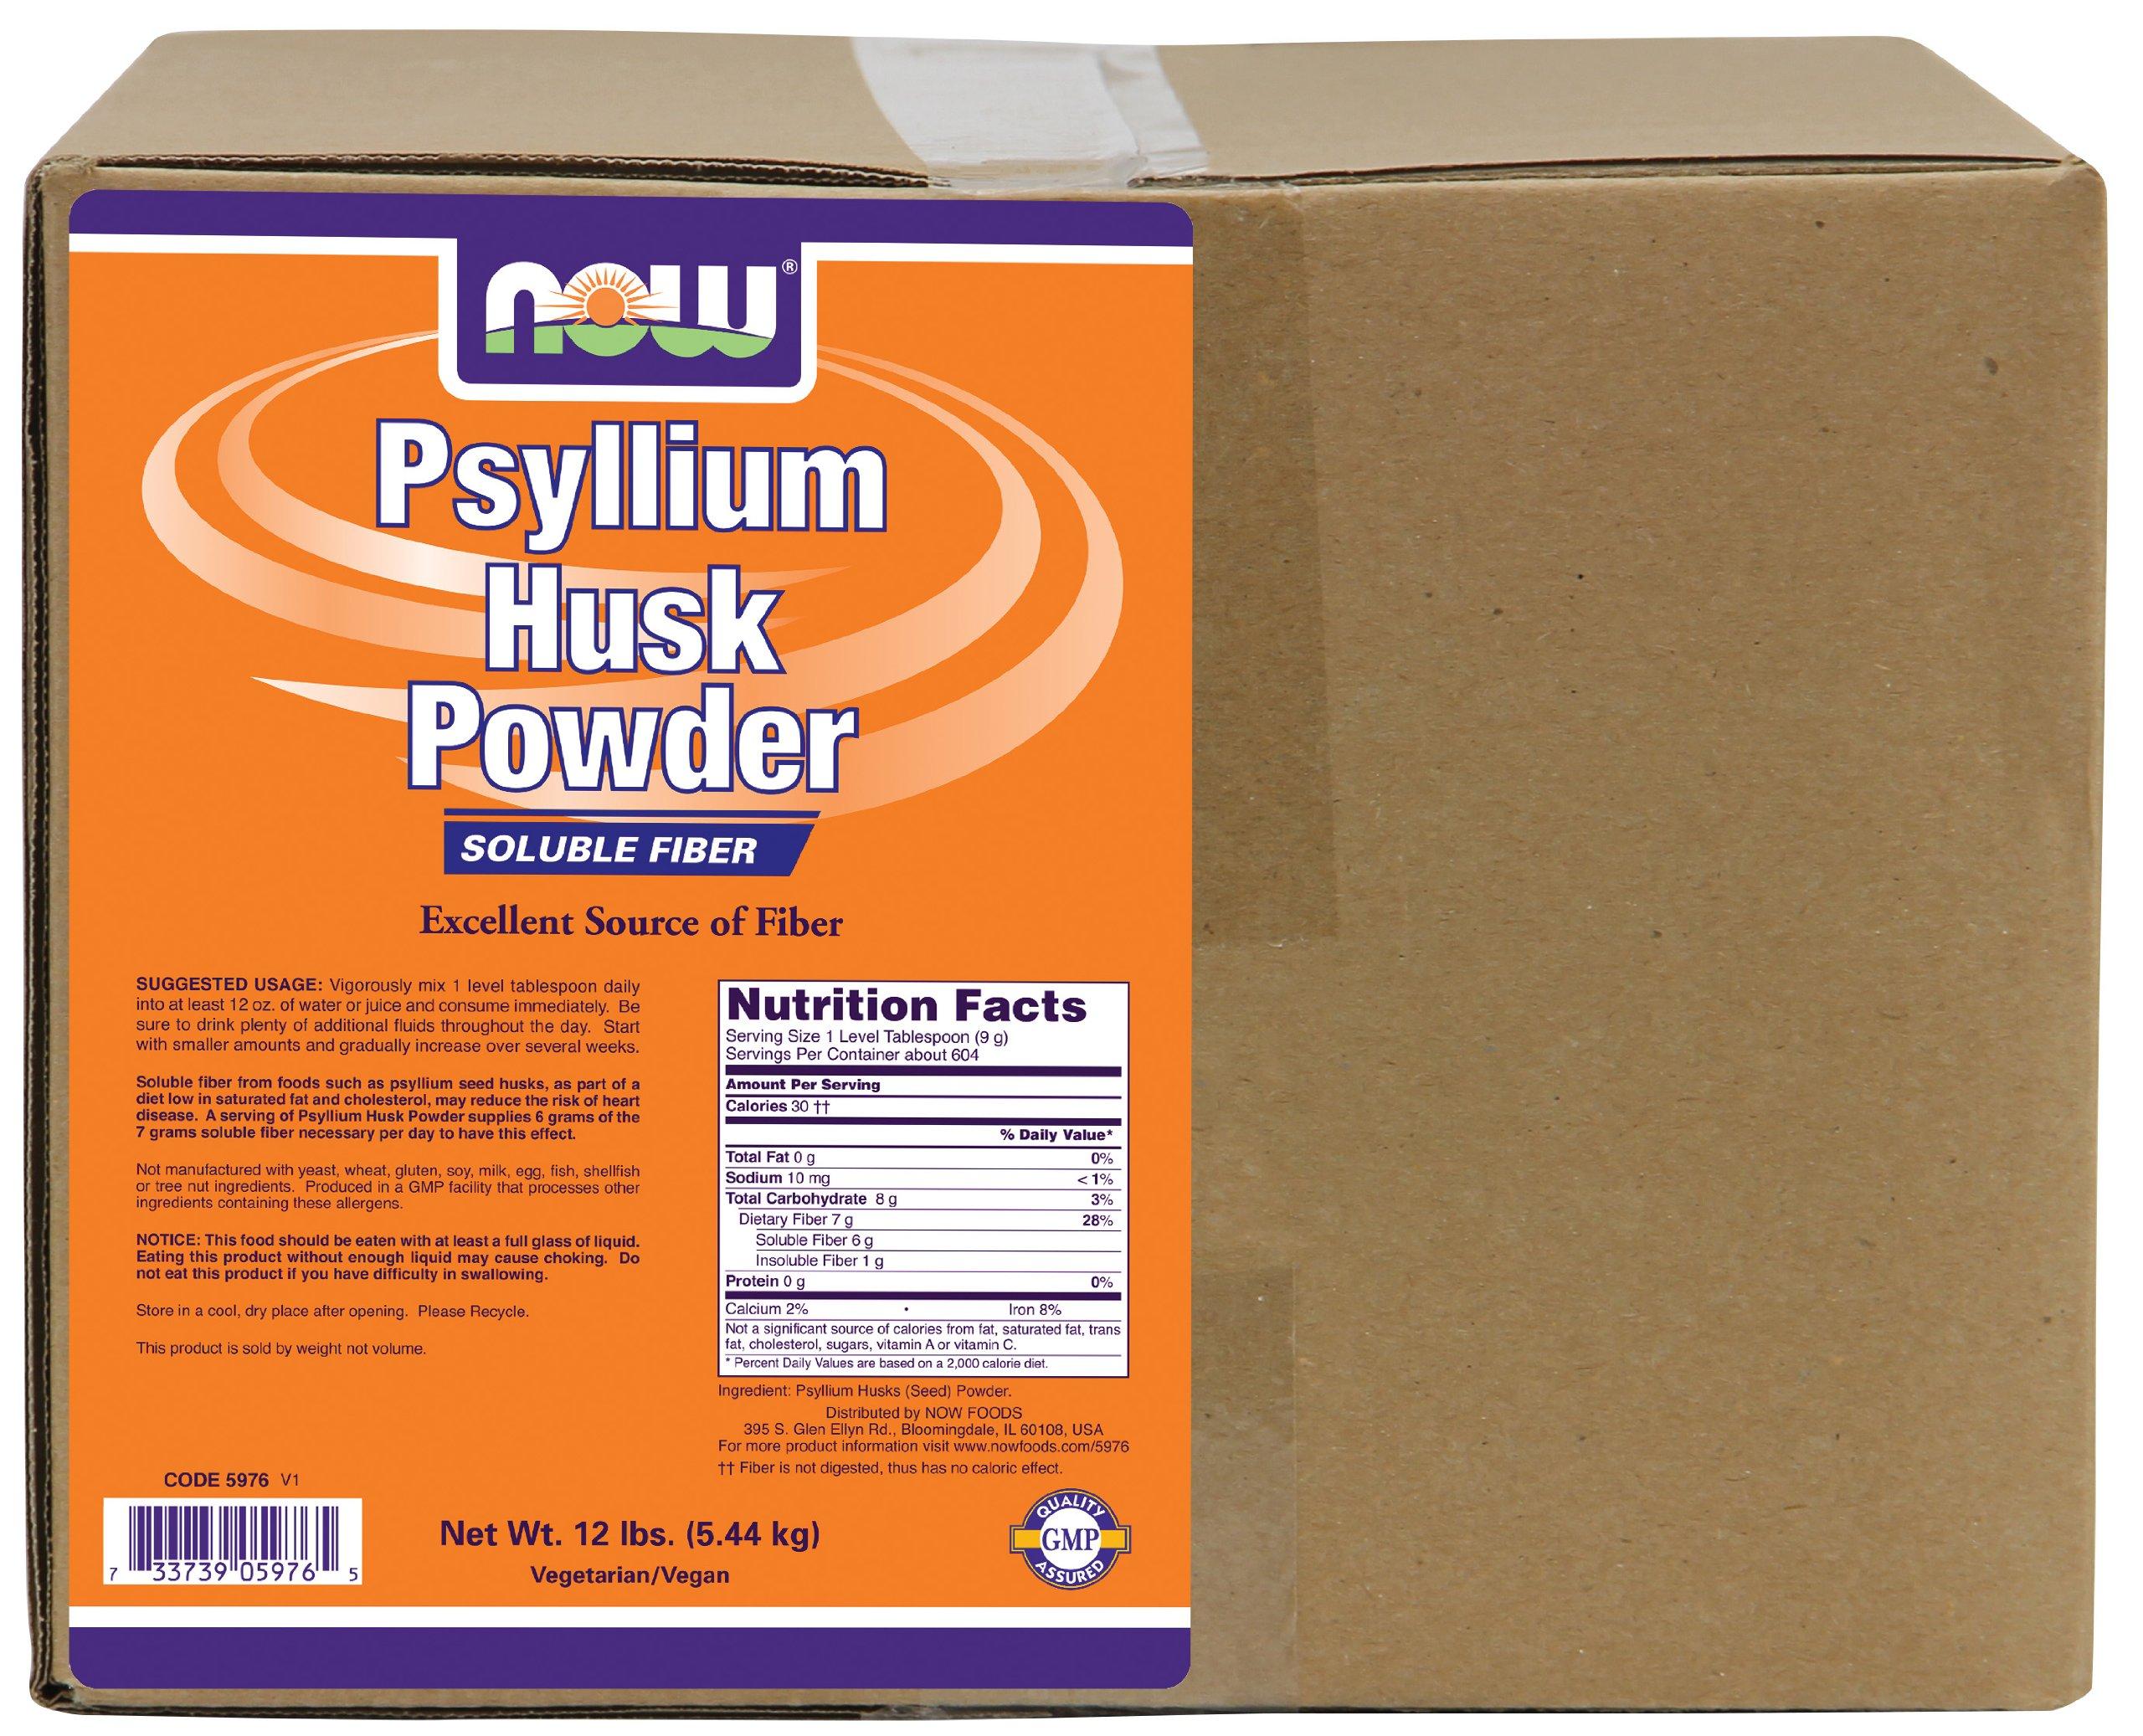 NOW Foods Psyllium Husk Powder, 12 Pound